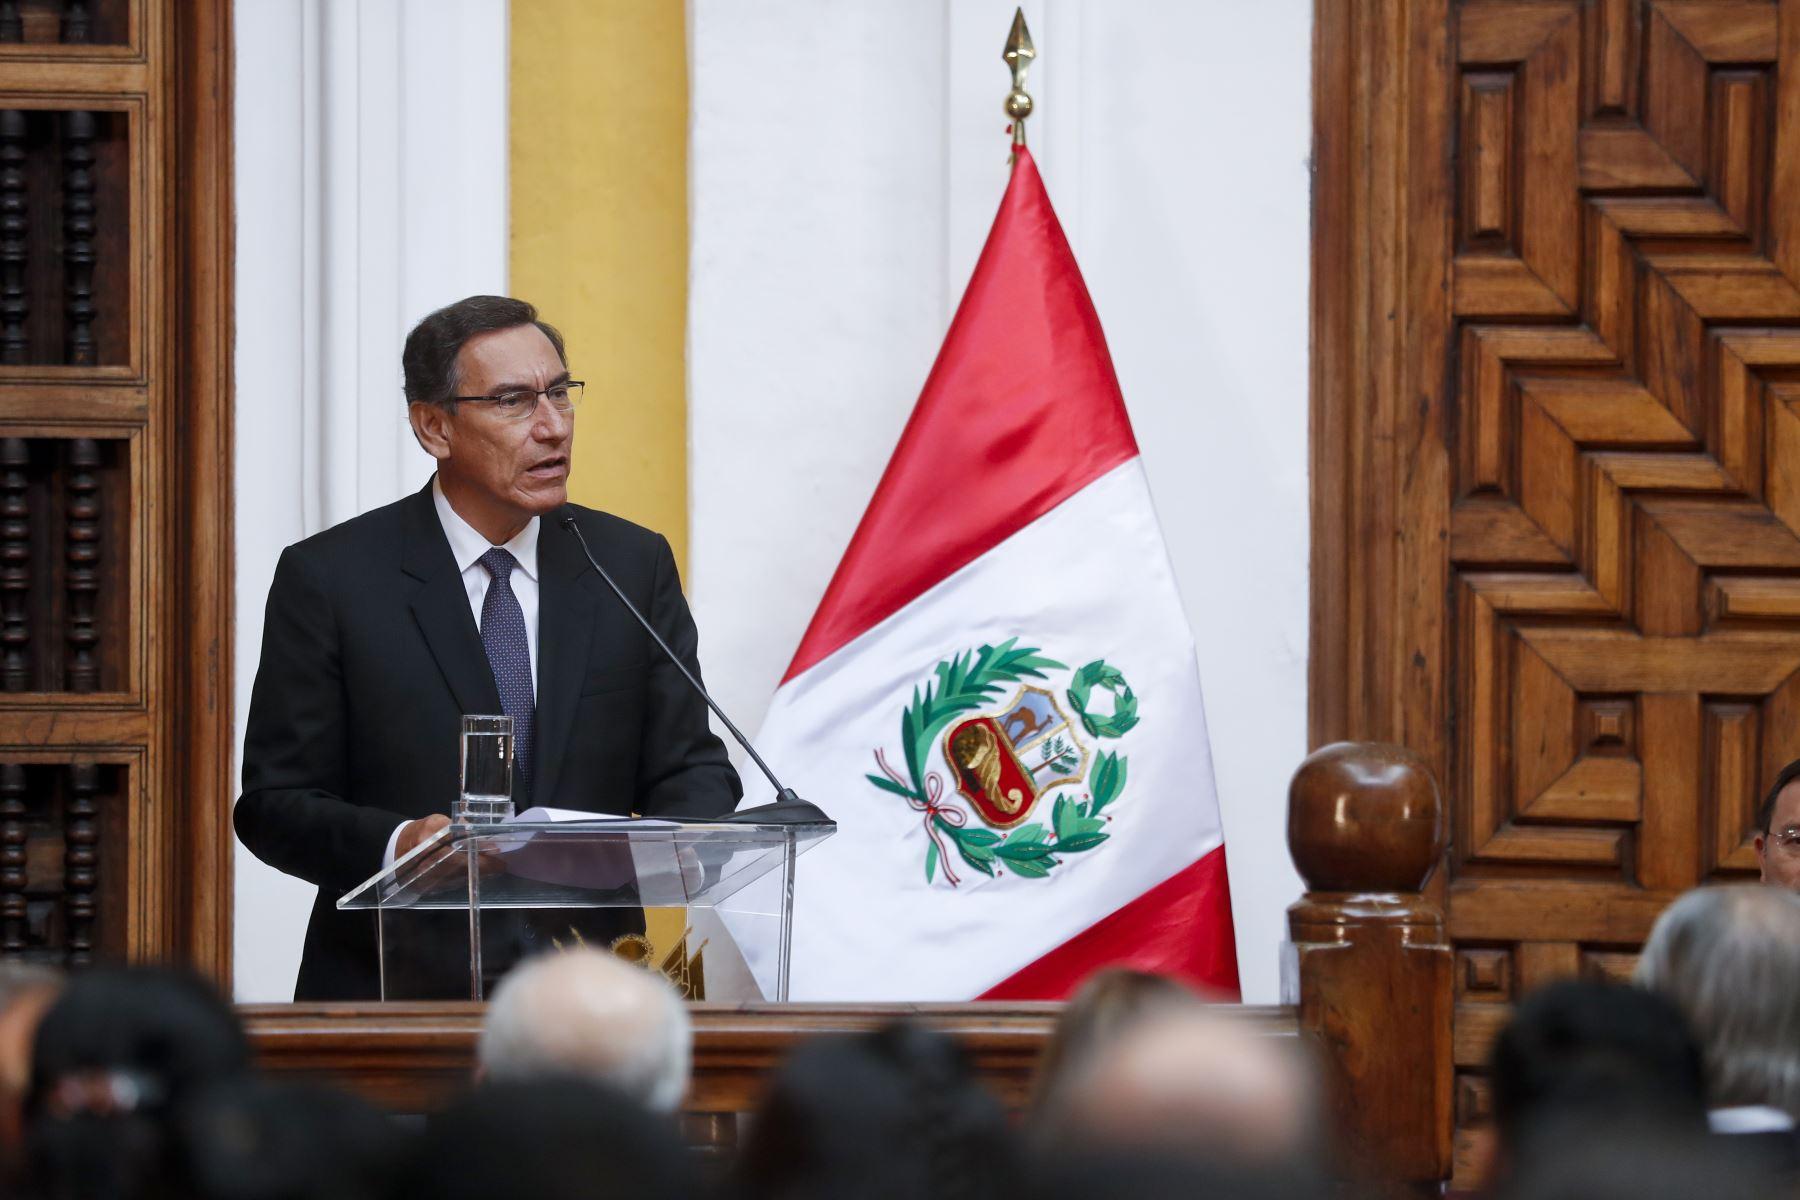 Martin Vizcarra: